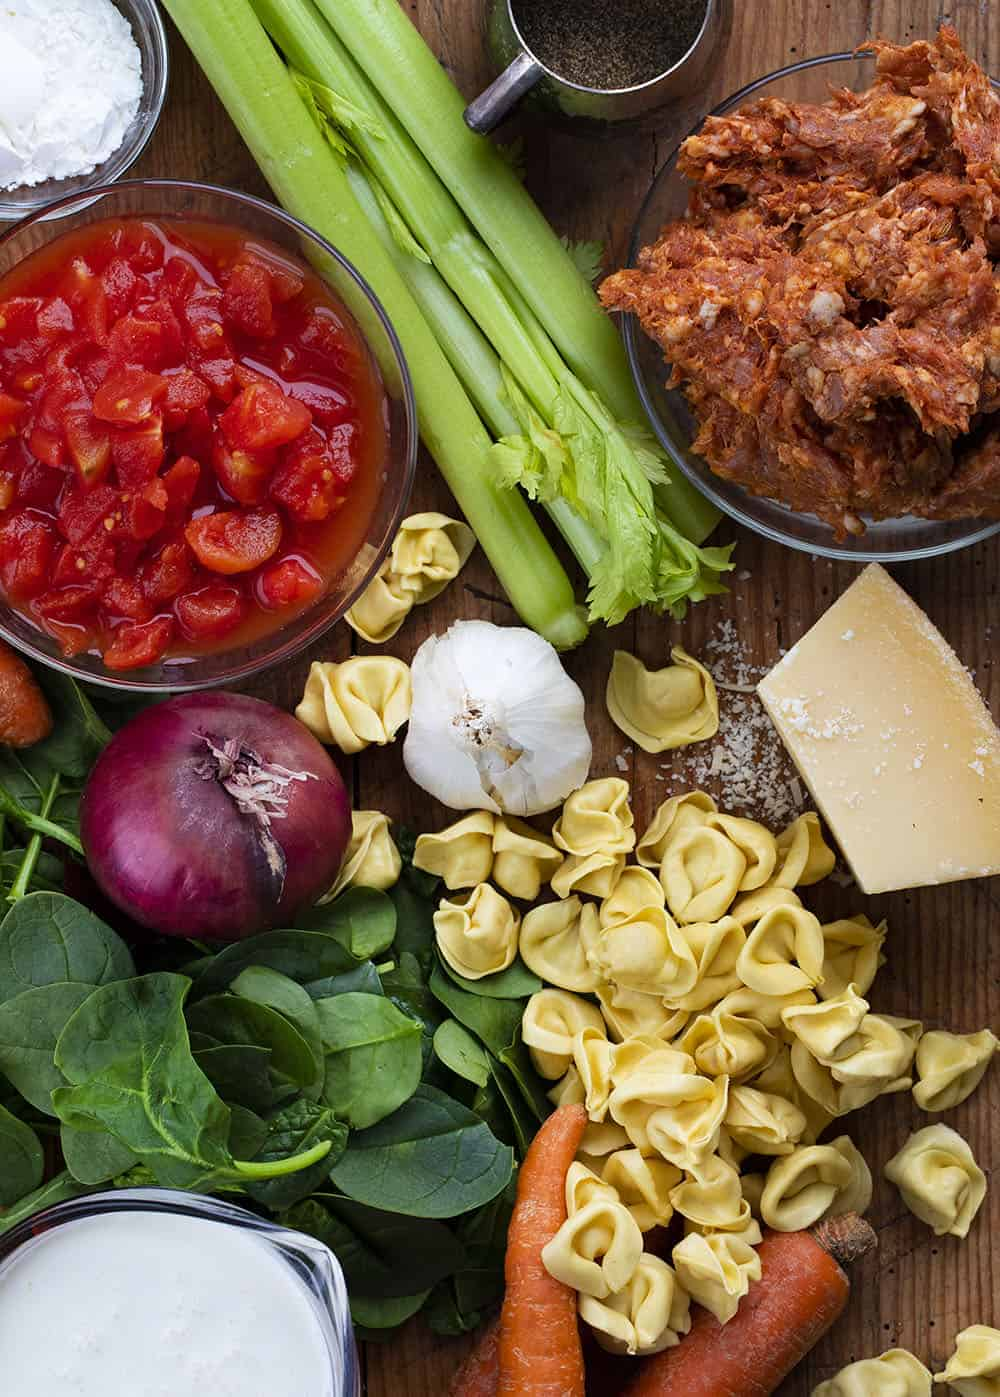 Raw Ingredients for Crockpot Sausage Tortellini Soup